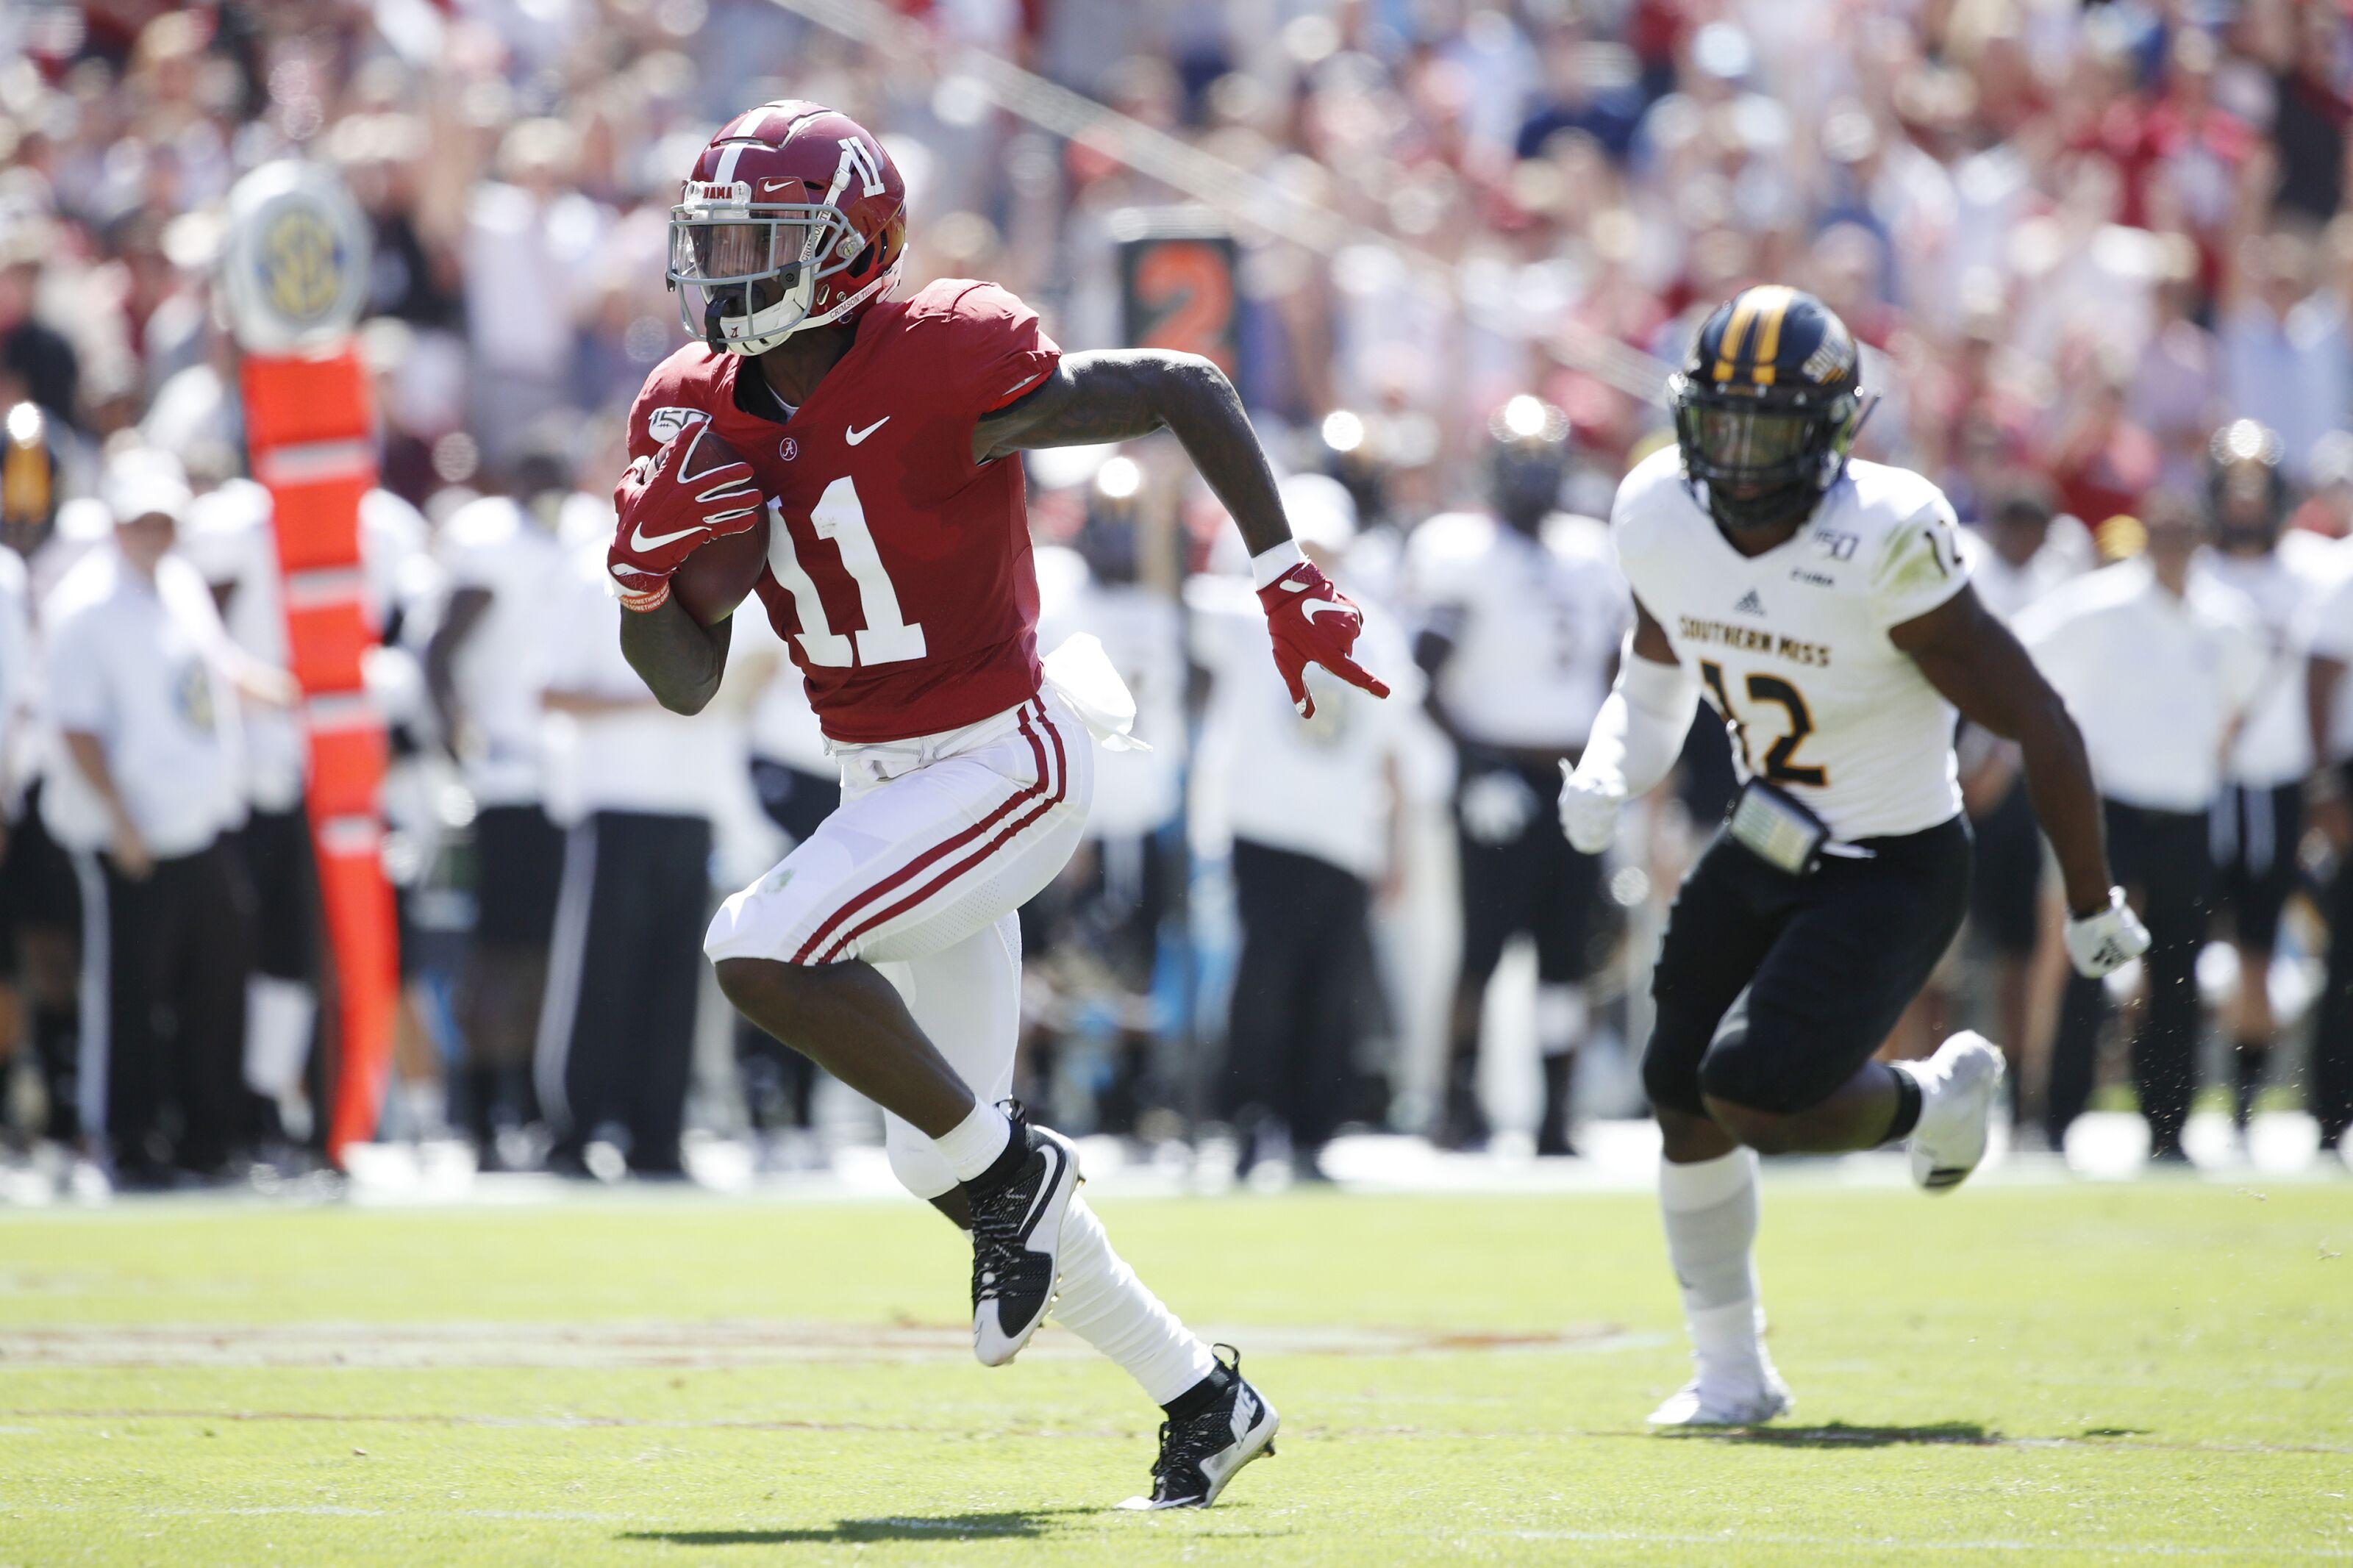 Alabama Football: Tide rolls over USM and more injury news